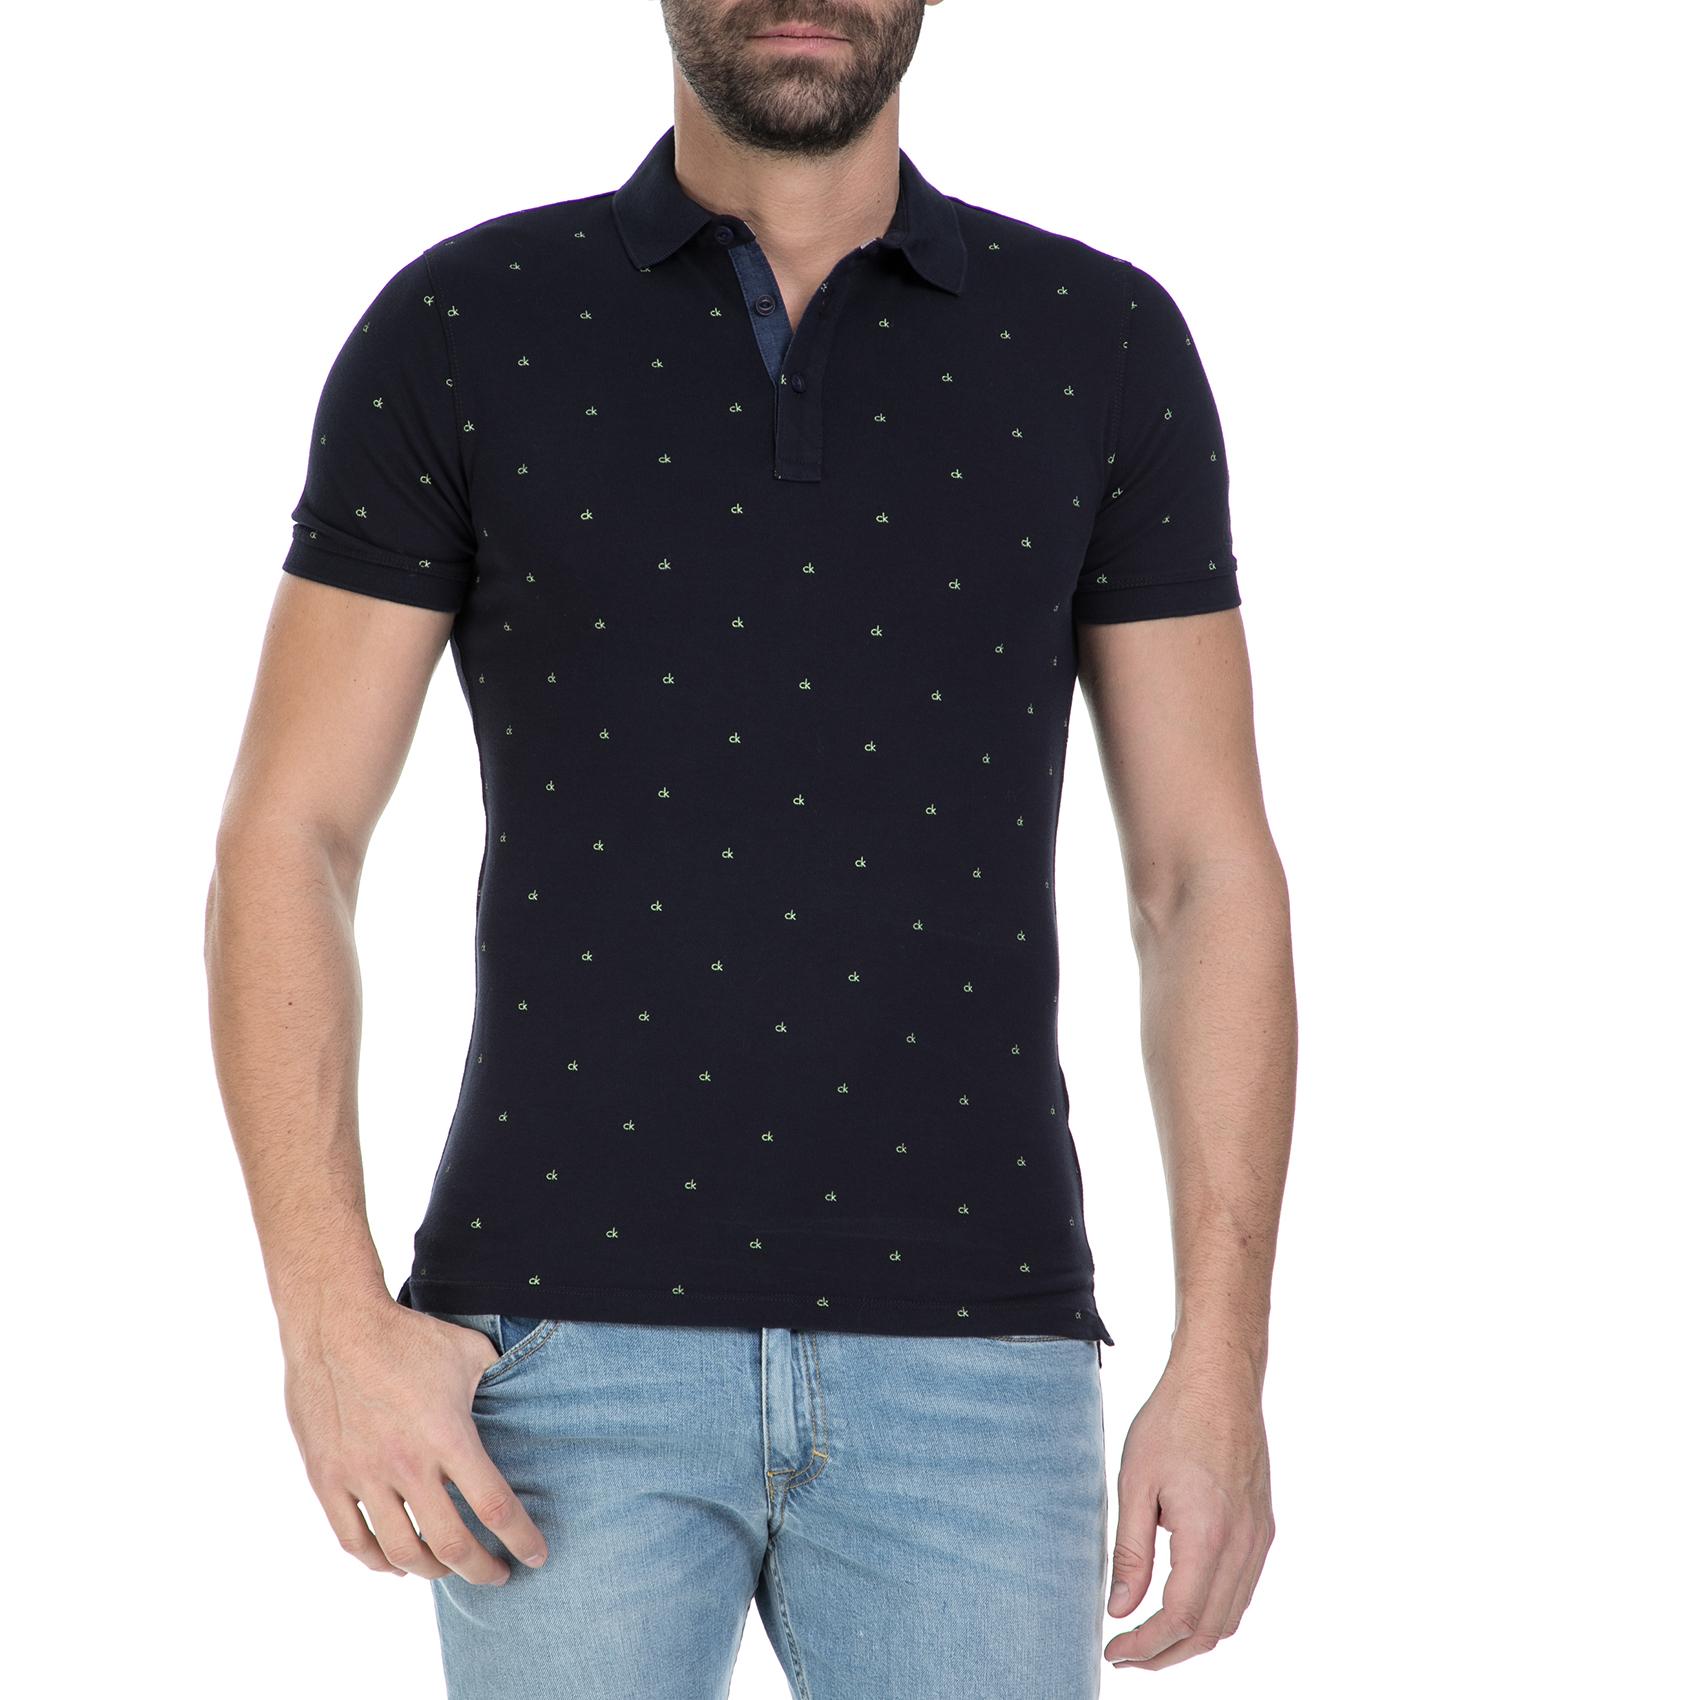 CALVIN KLEIN JEANS - Ανδρική κοντομάνικη μπλούζα polο Calvin Klein Jeans  μπλε c805170c3a0